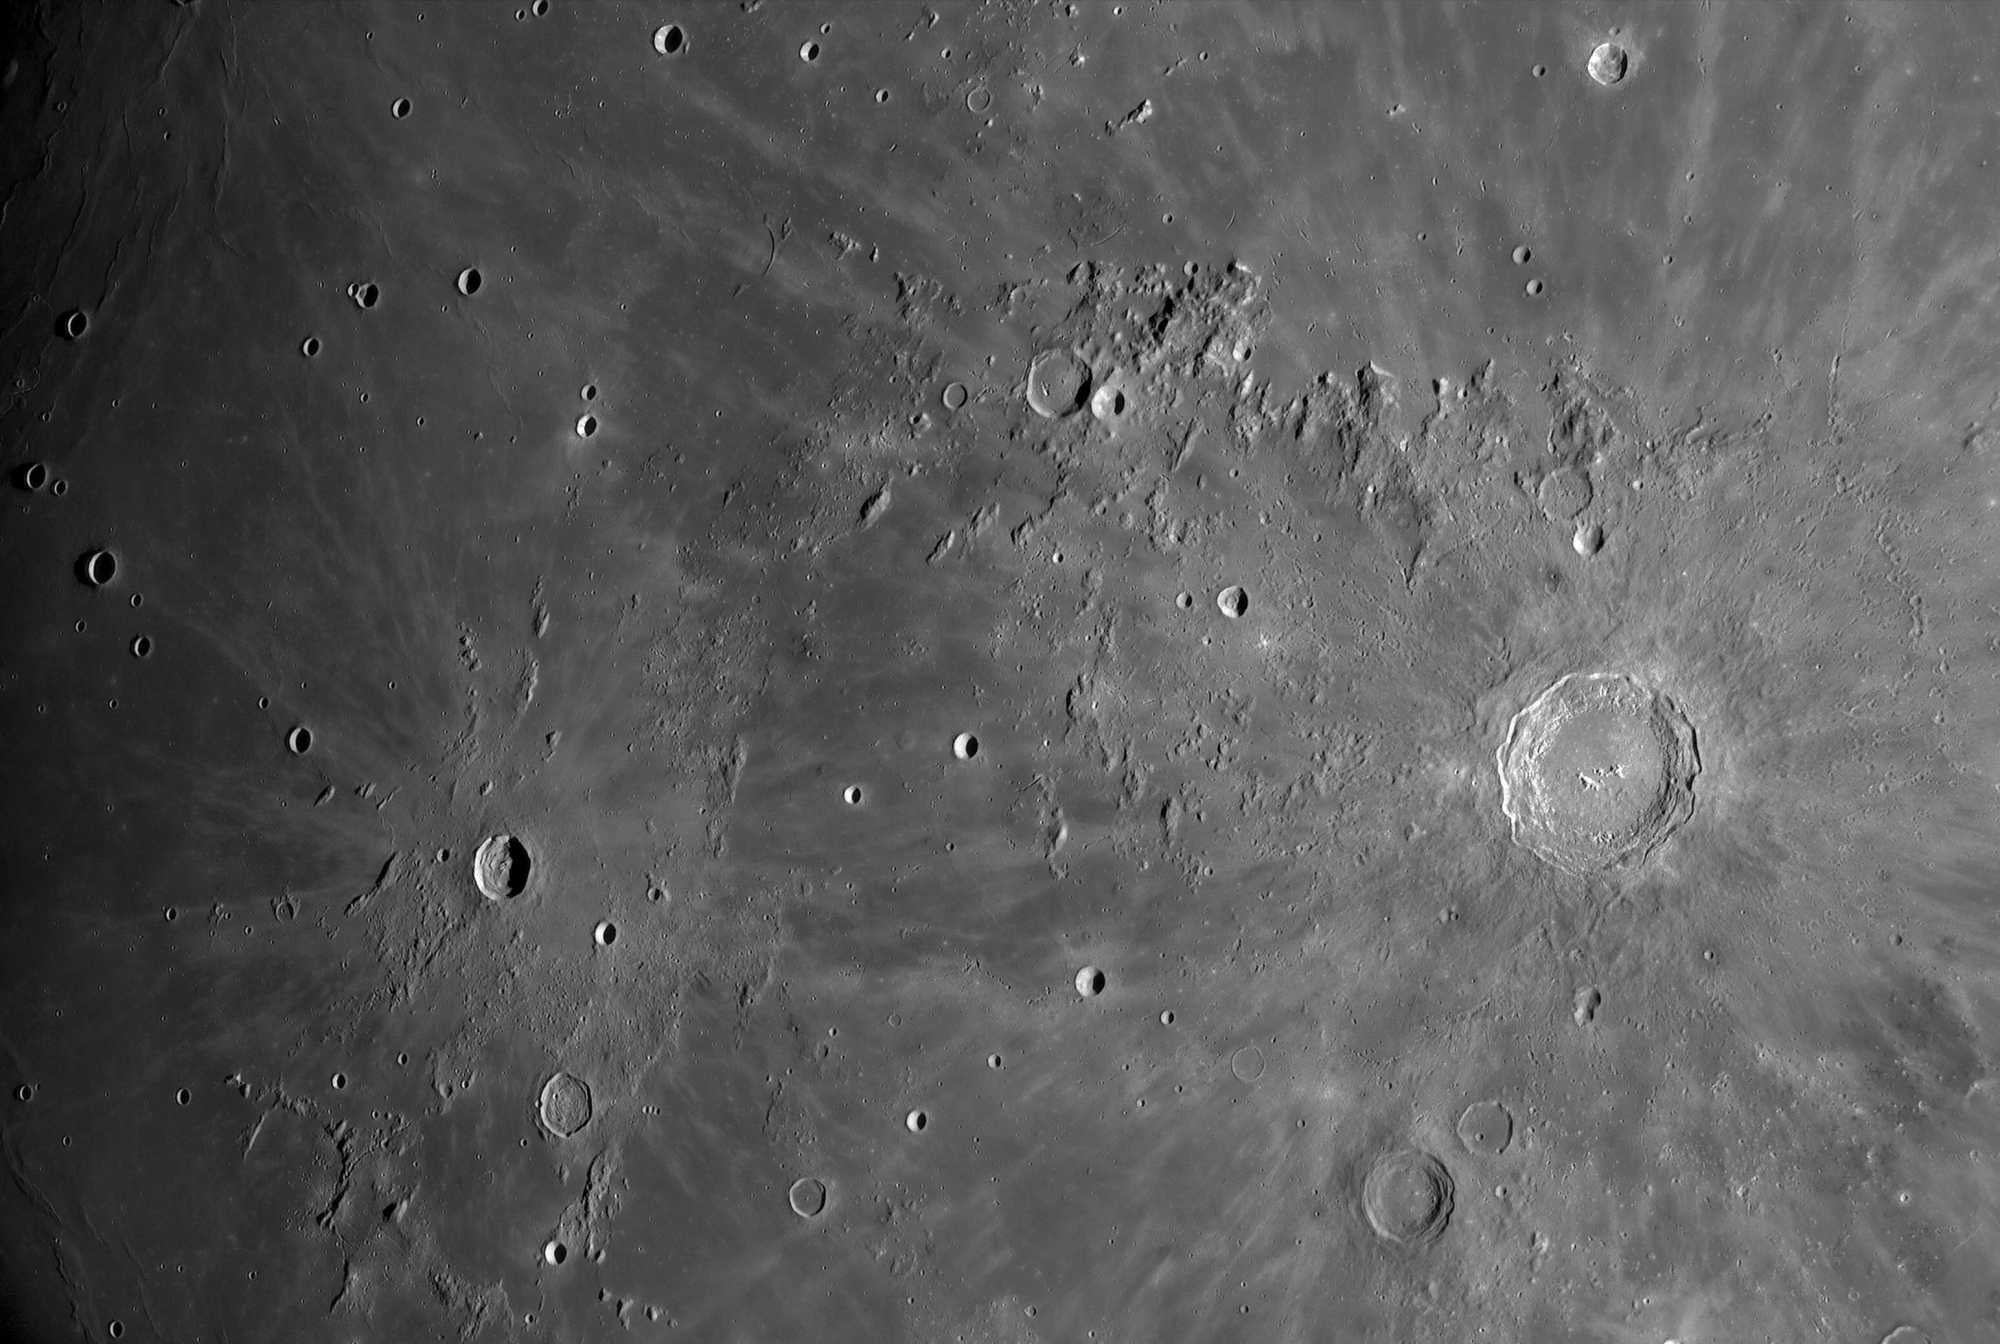 5e443aab3267a_L_Copernic-Kepler_050220_PPrevuClaude.thumb.jpg.6d4c4eece1728d8c66f9c1dc51a297e3.jpg